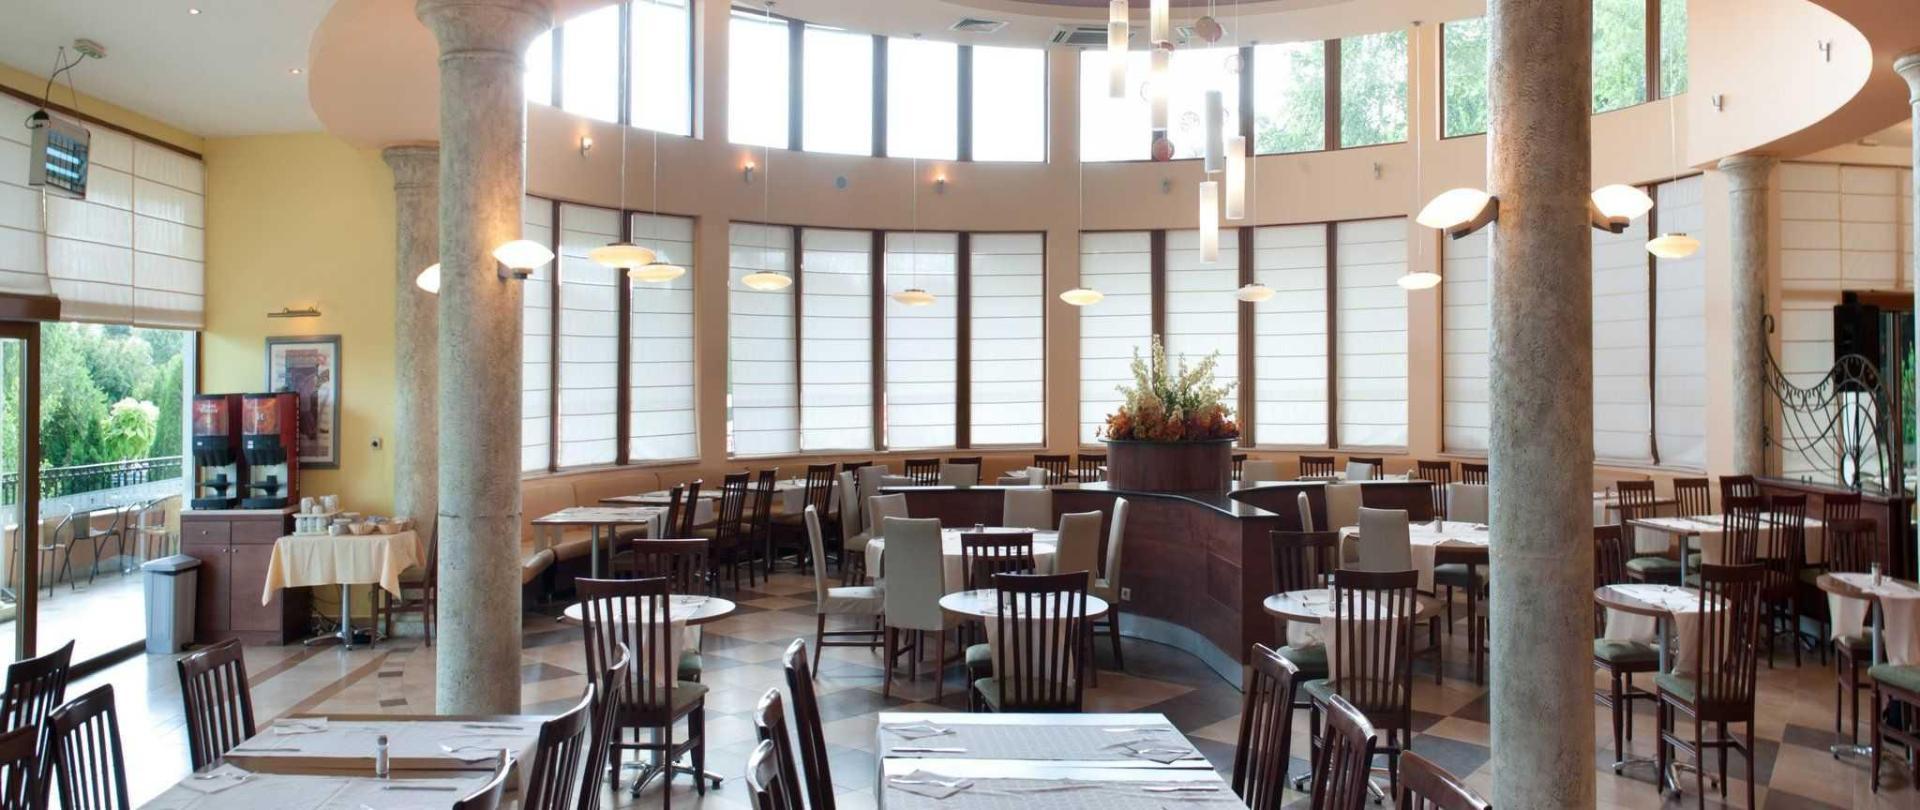 restaurant-ralitsa-superior-1.jpg